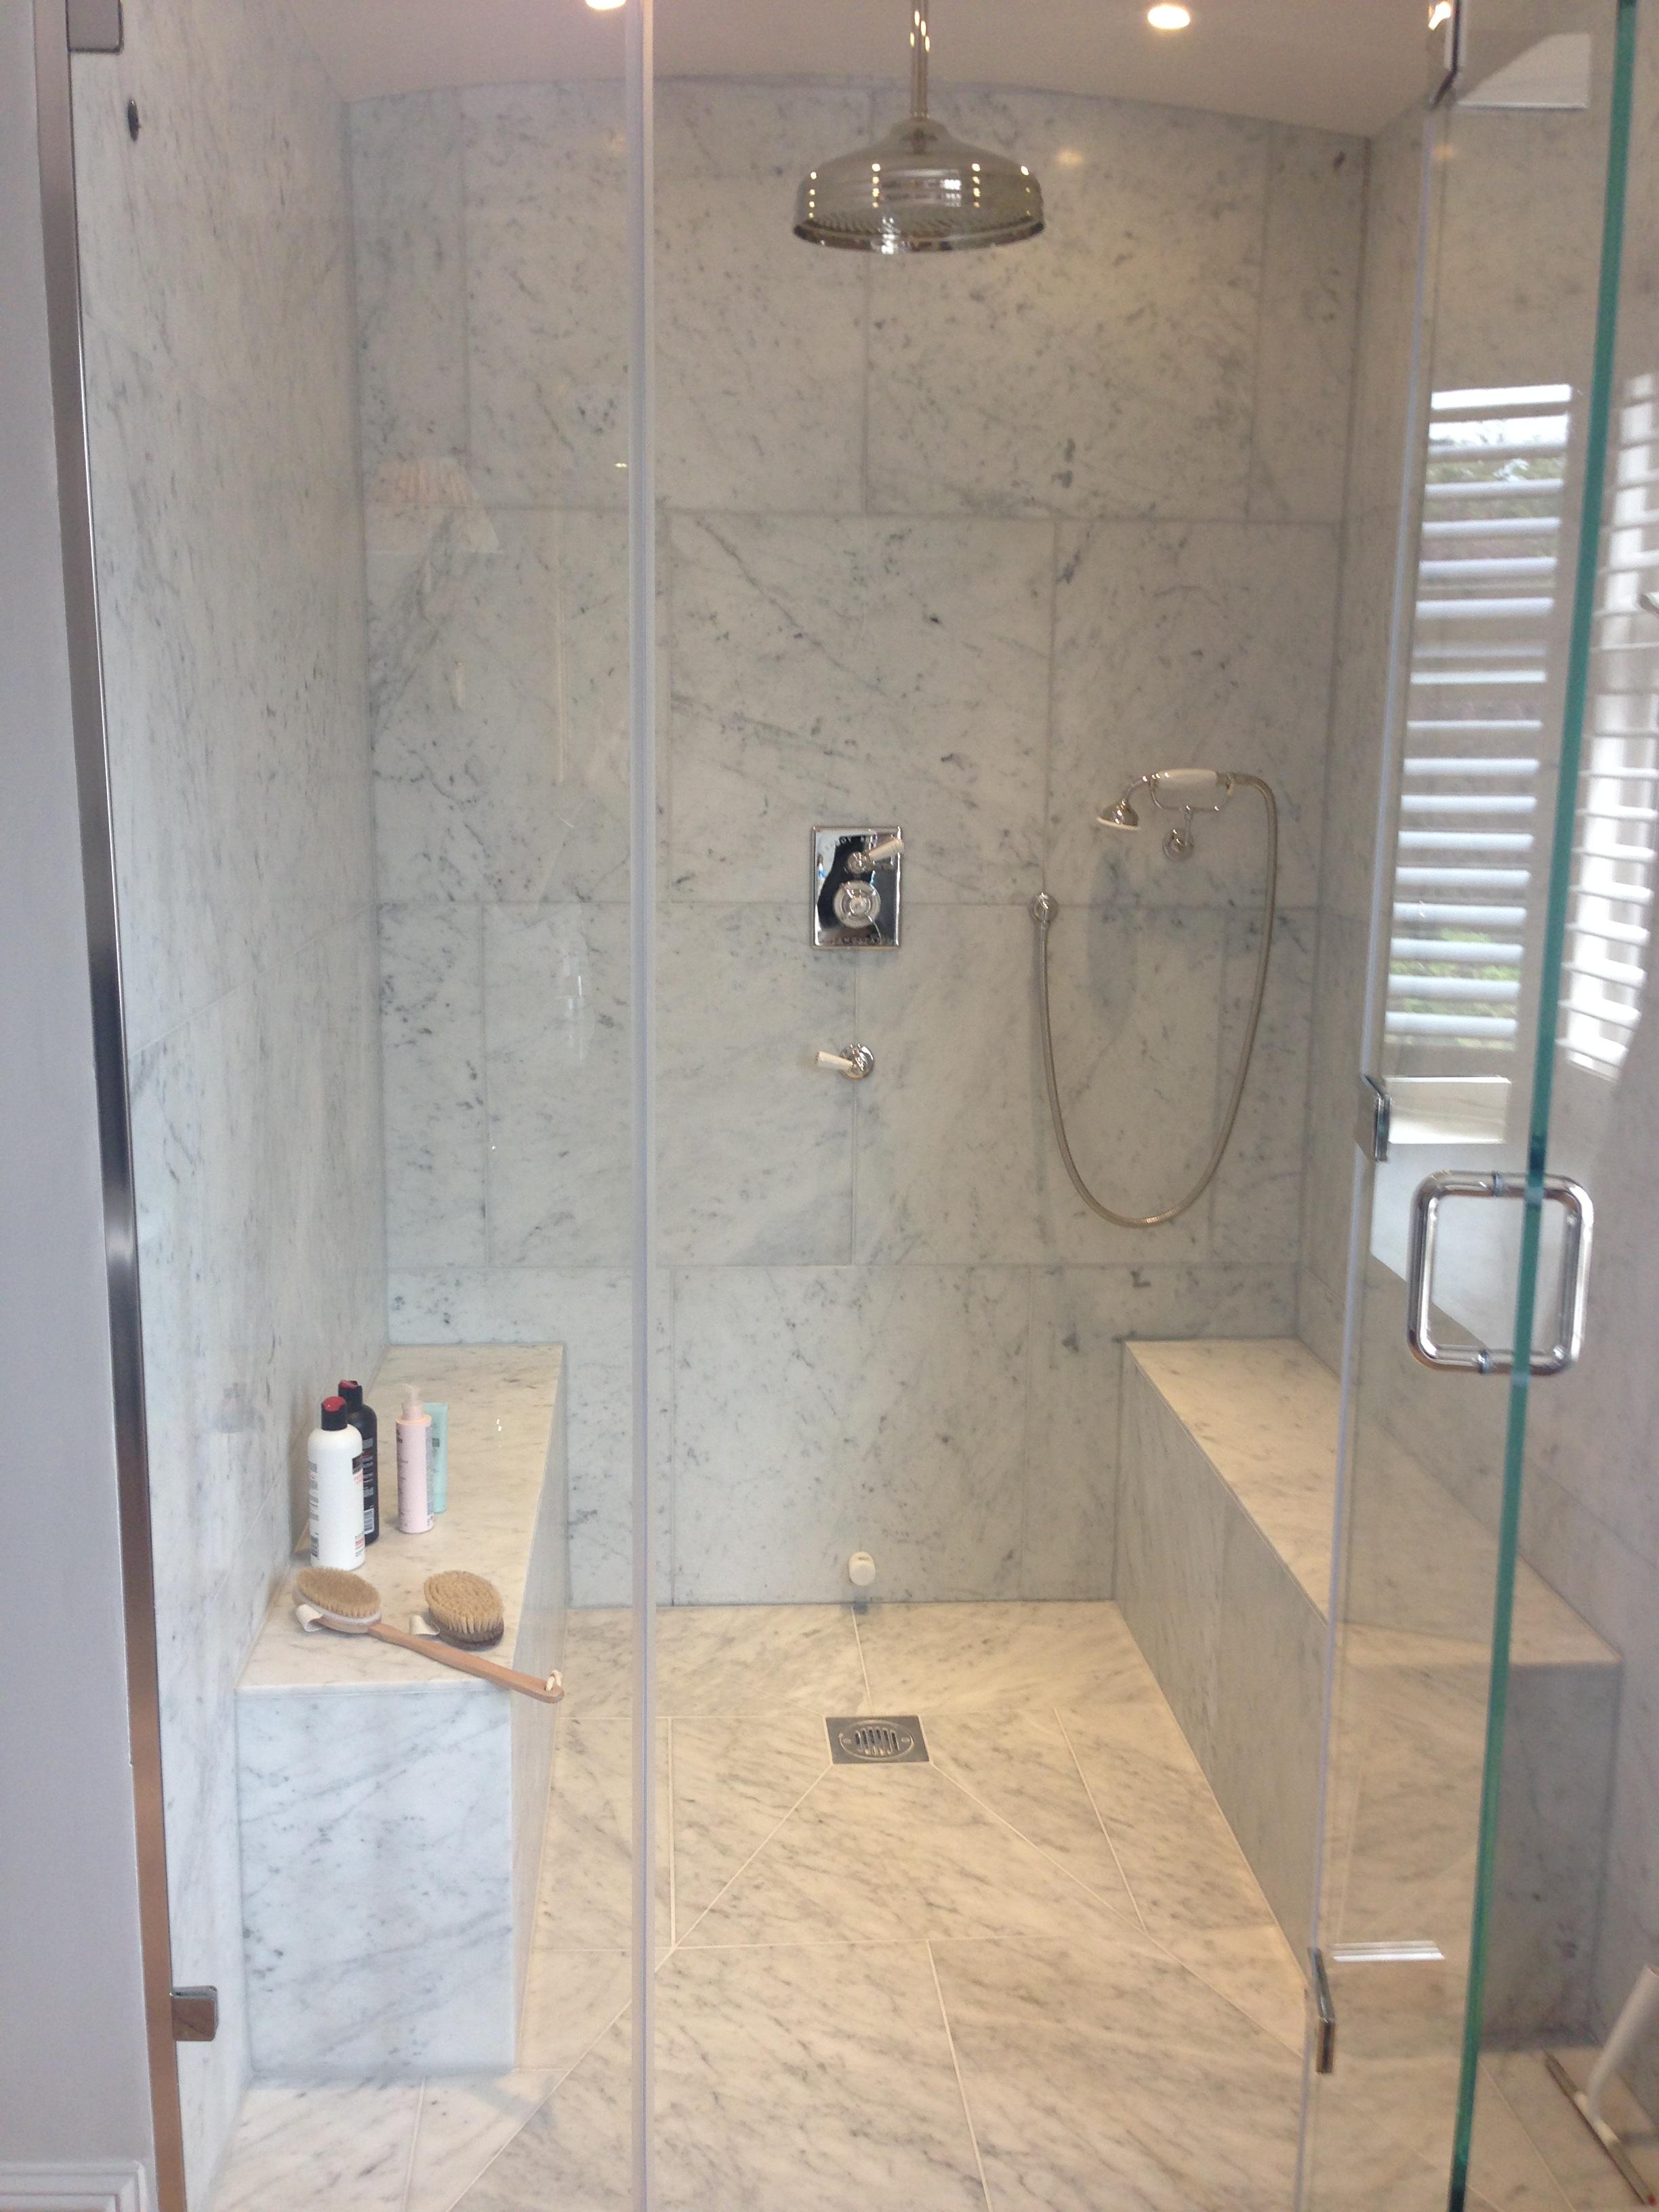 House 5 - Master Bedroom Shower Room